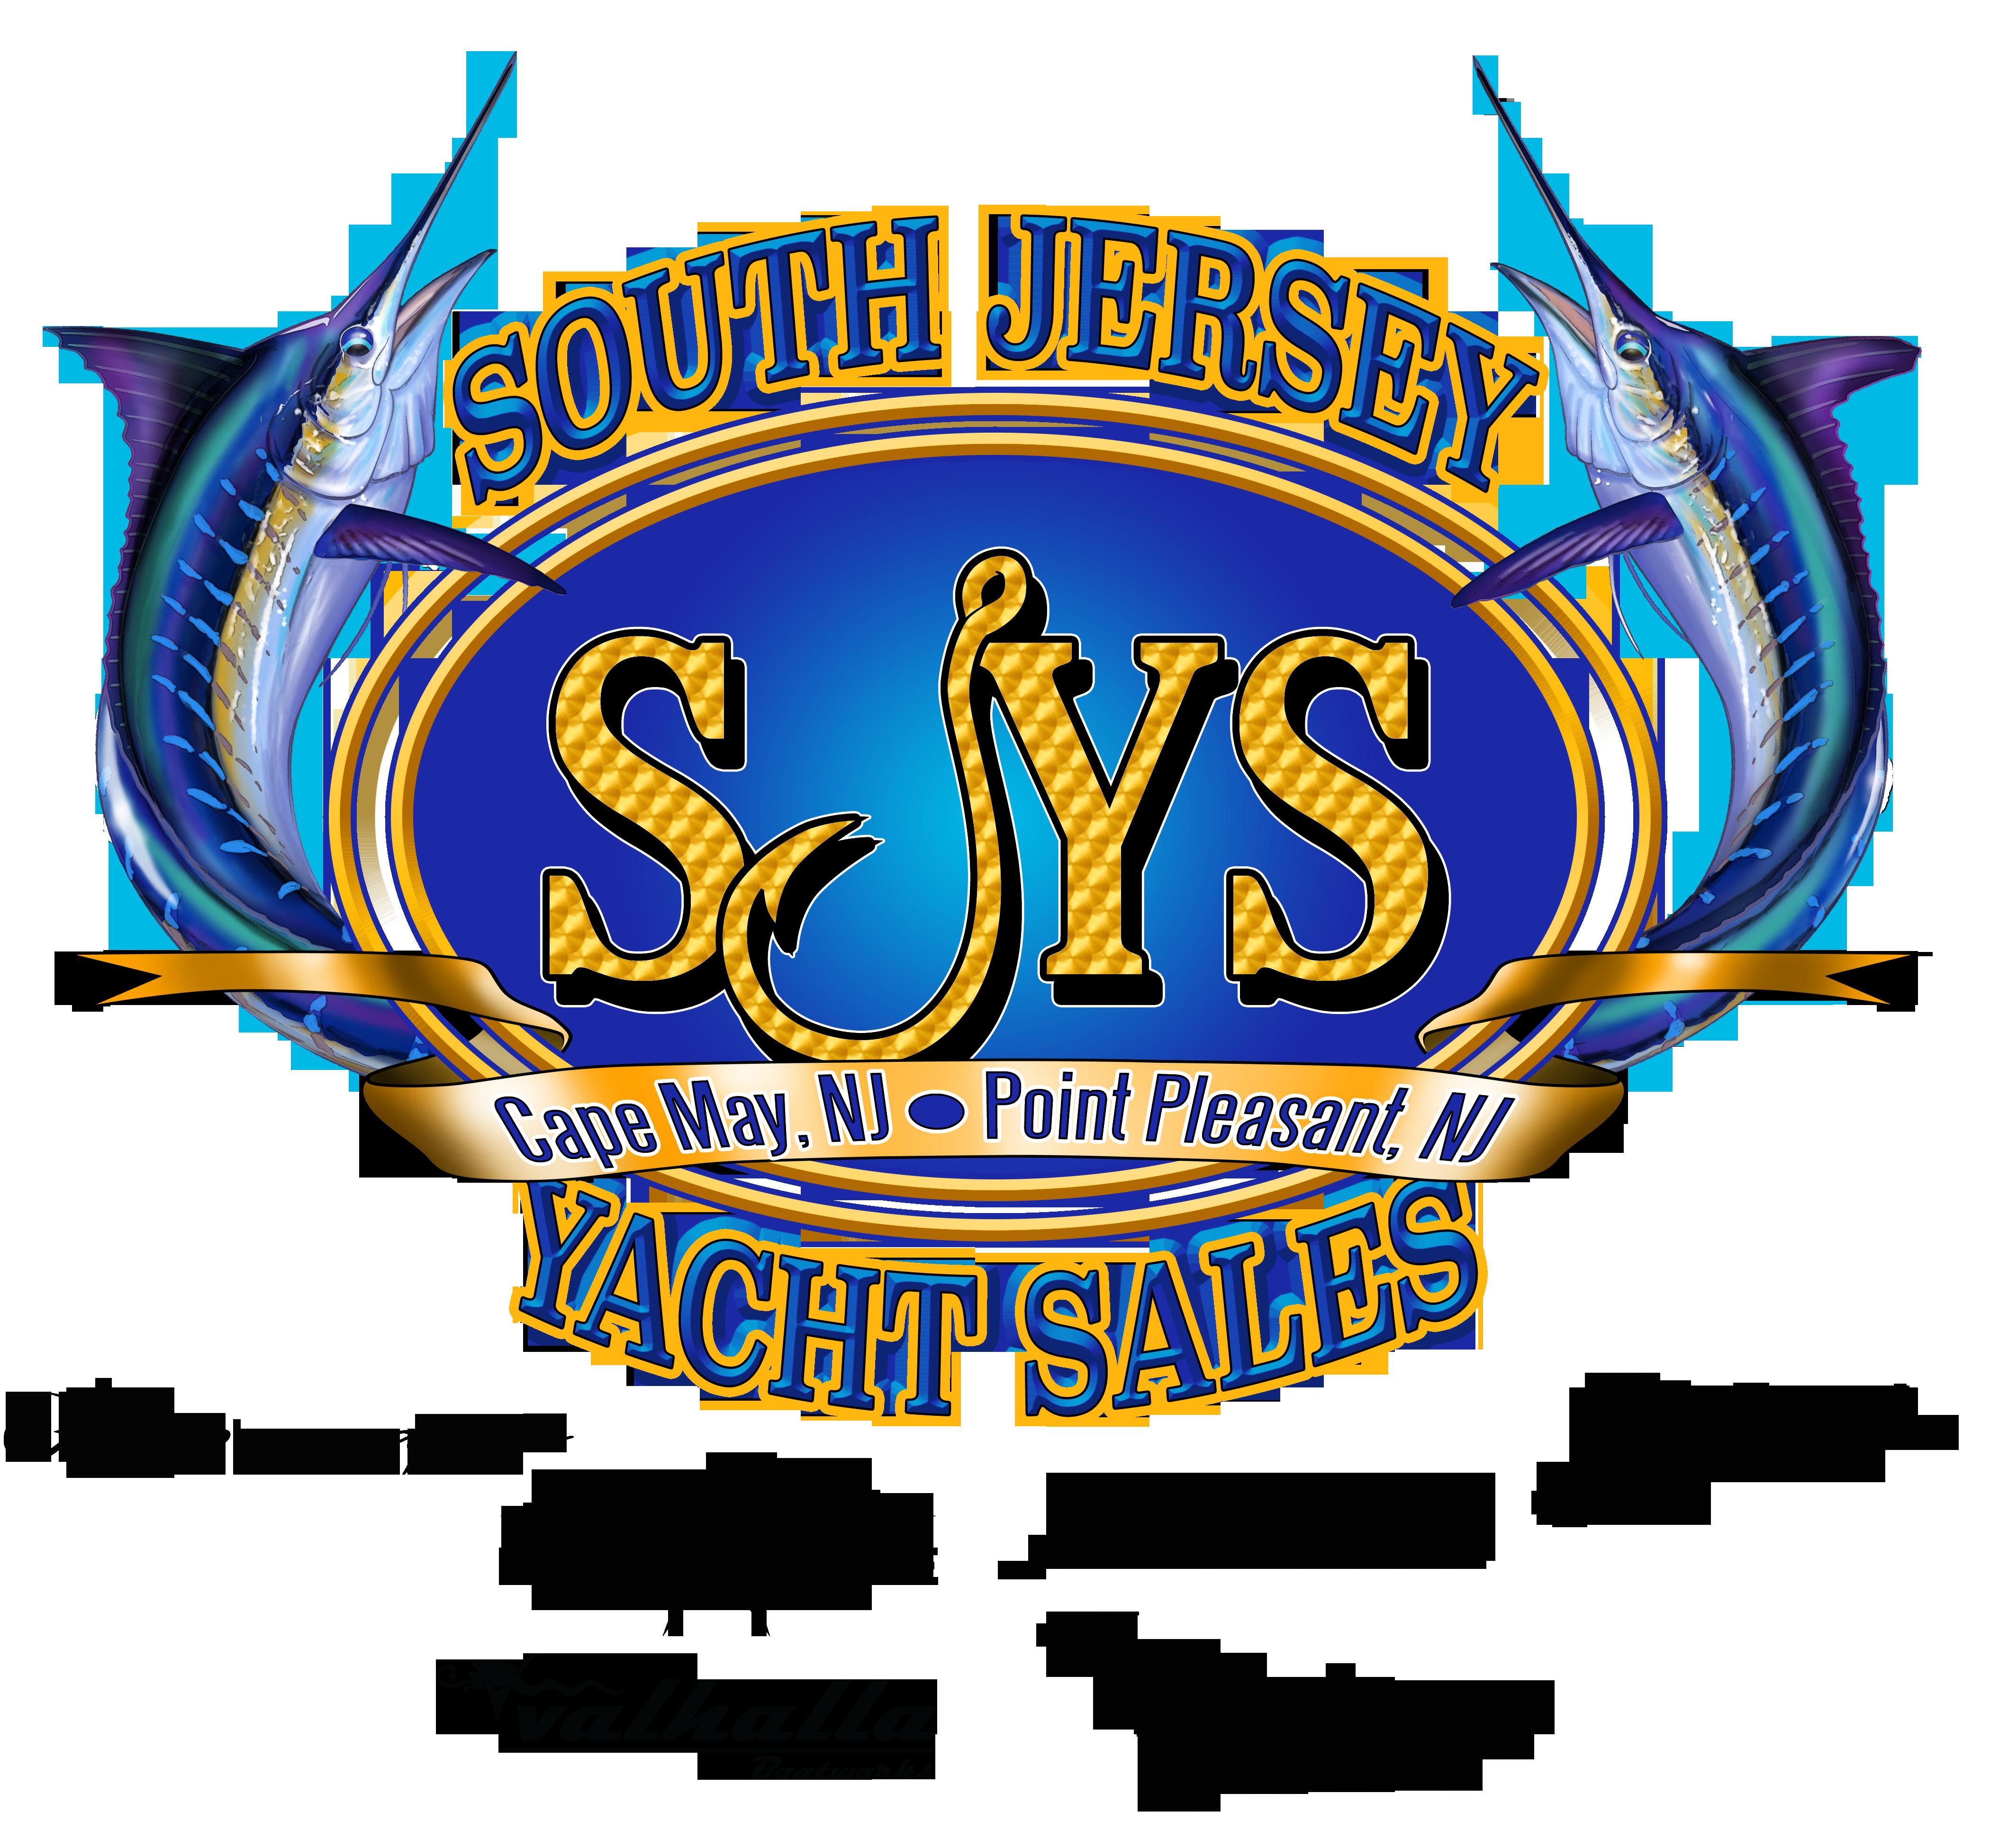 South Jersey Yacht Sales - Pt. Pleasant Logo